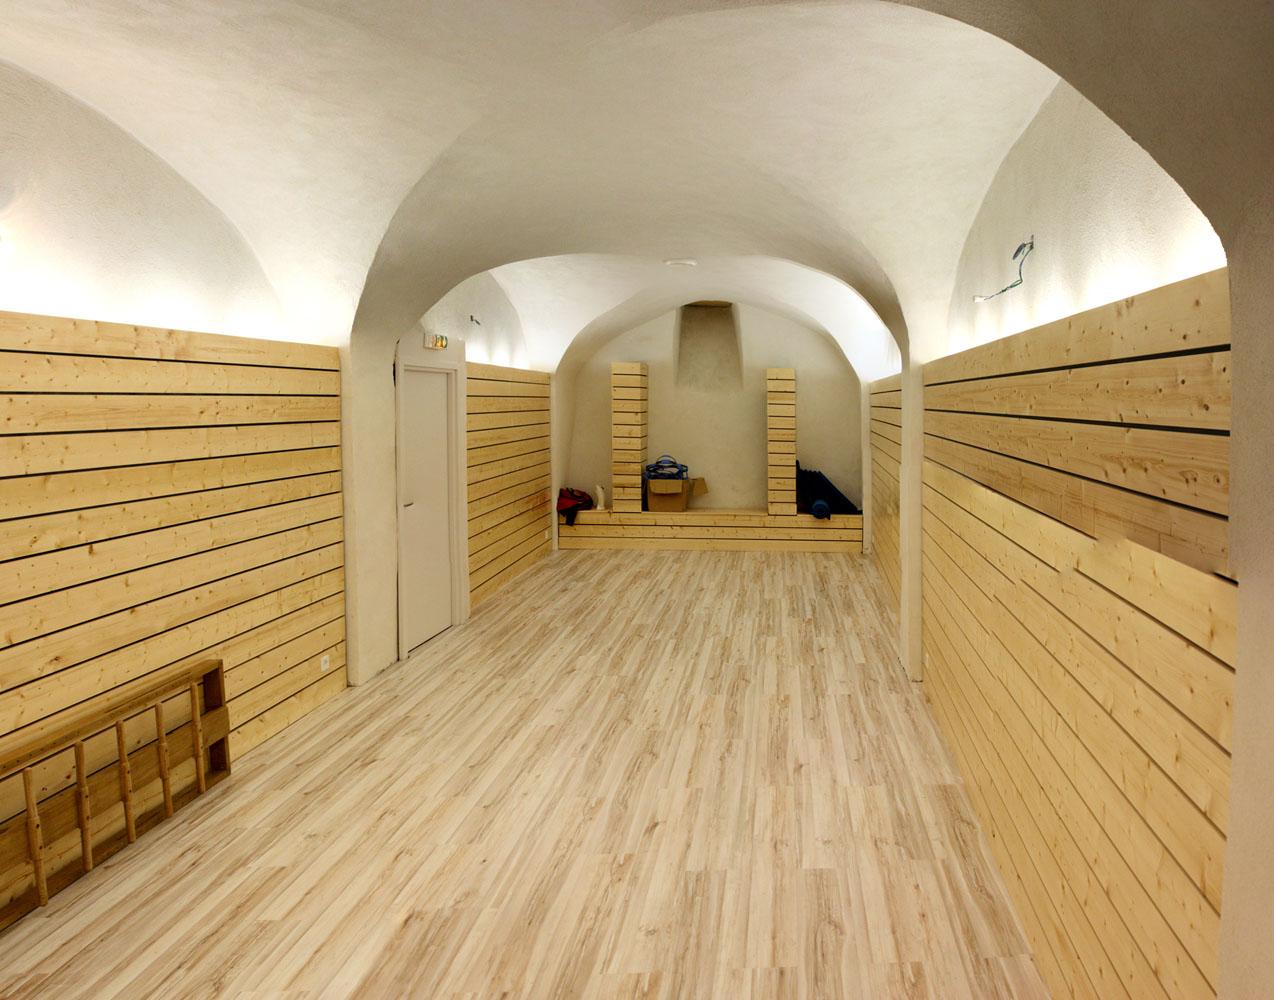 Galerie atelier casa atelier d 39 architecture agence d - Cabinet ophtalmologie clermont ferrand ...